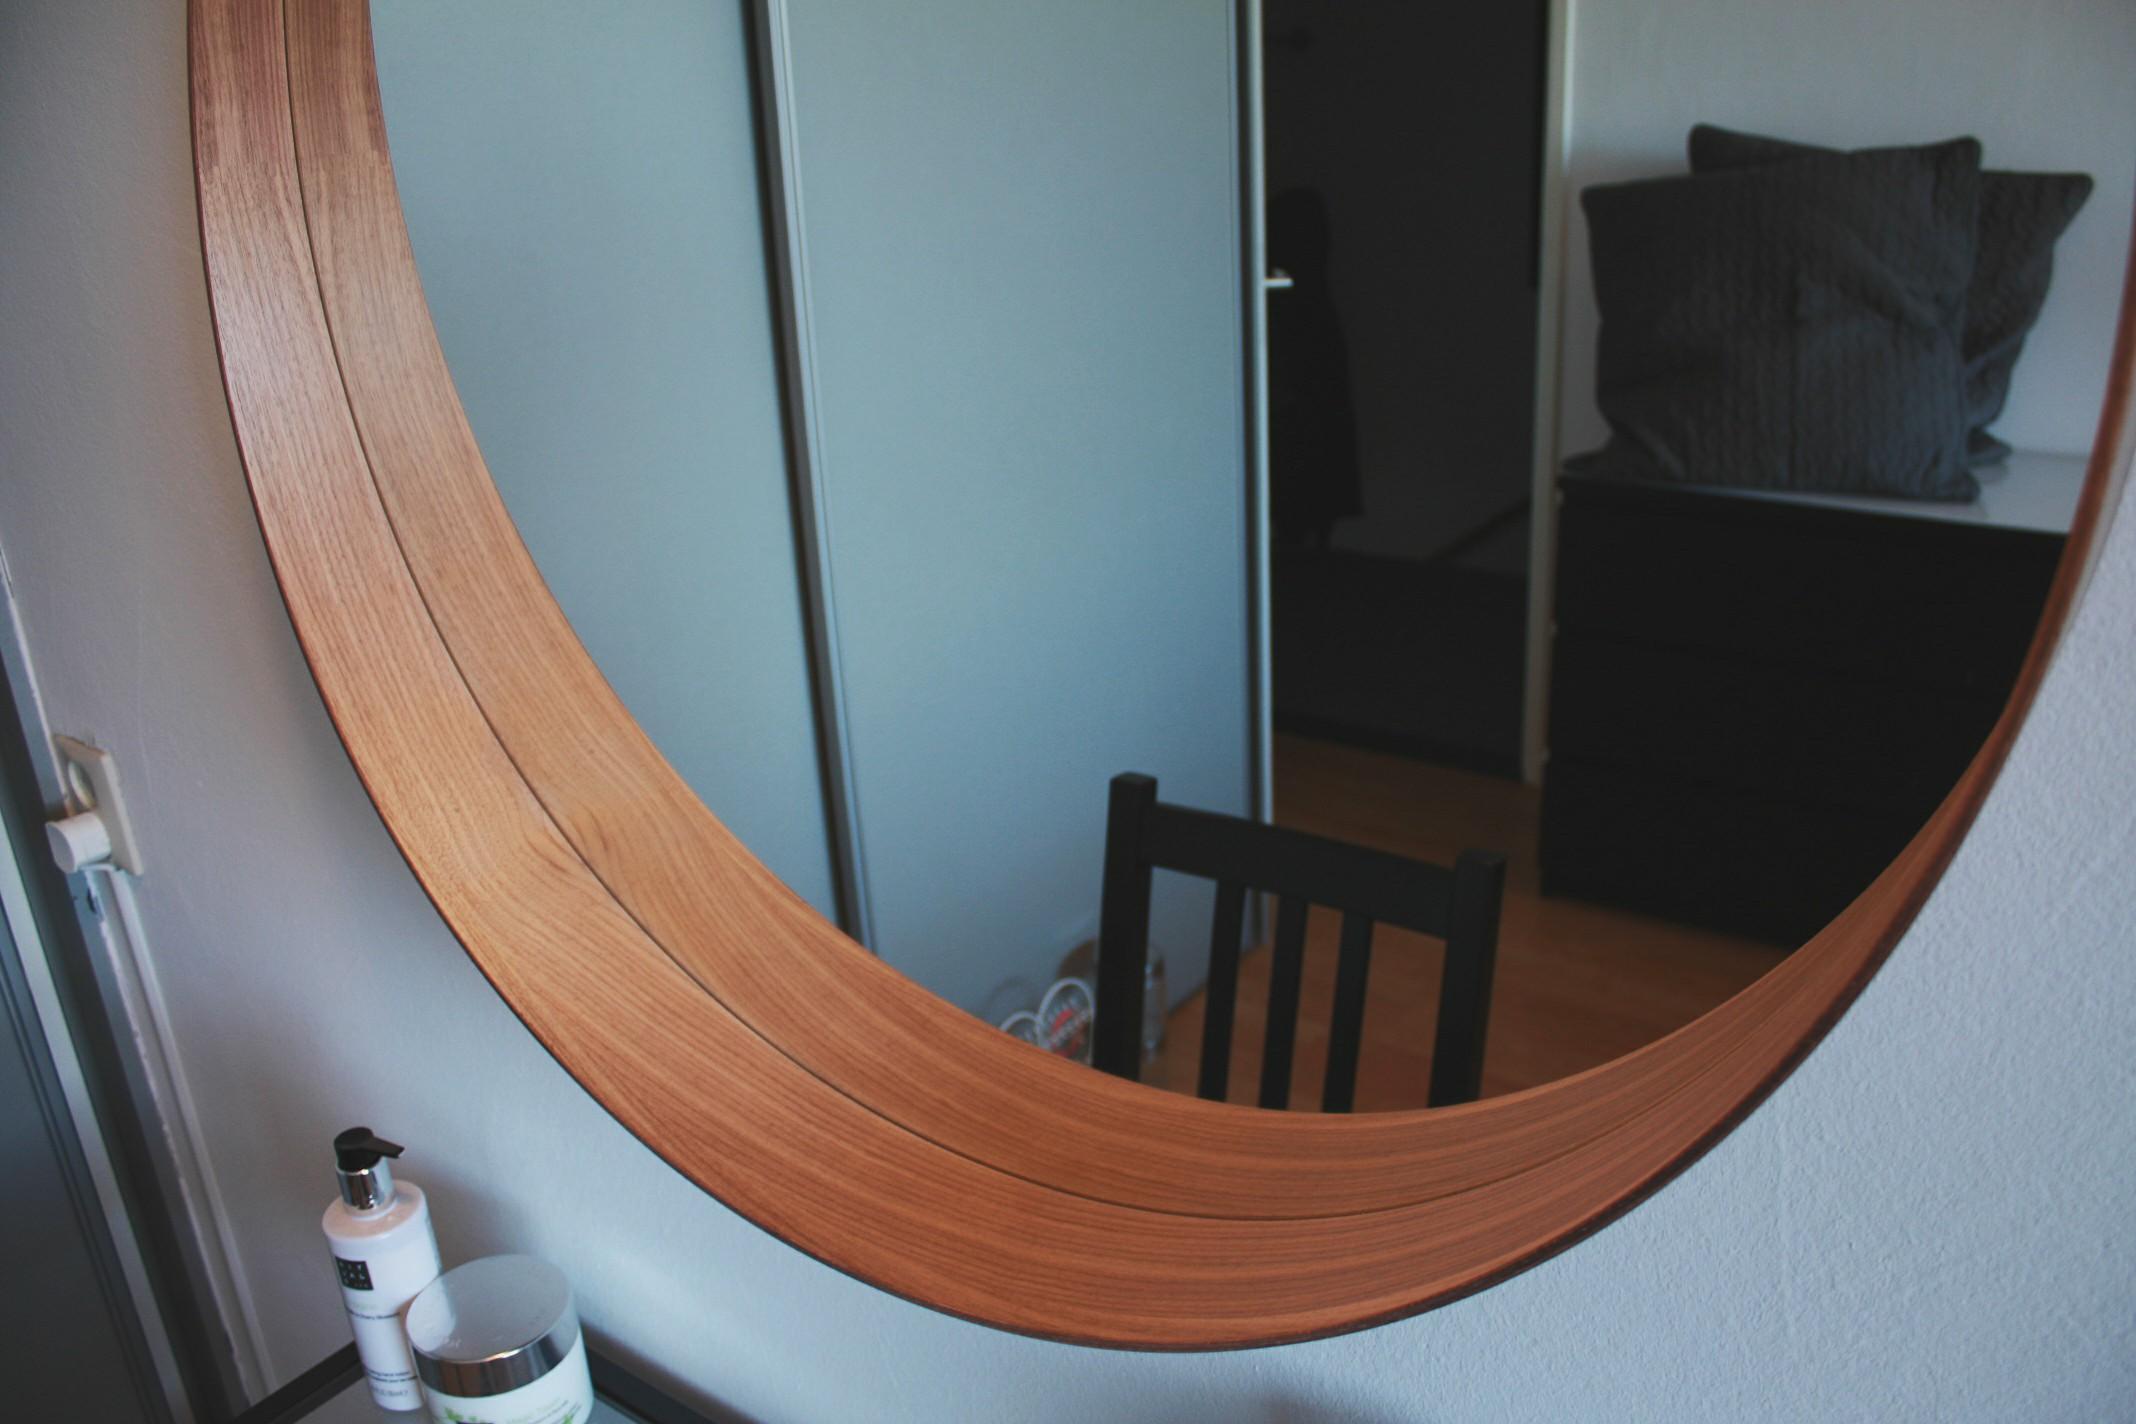 Design Kast Ikea : Ikea make up kast. best makeup kast met spiegel ikea ikea haat ikea